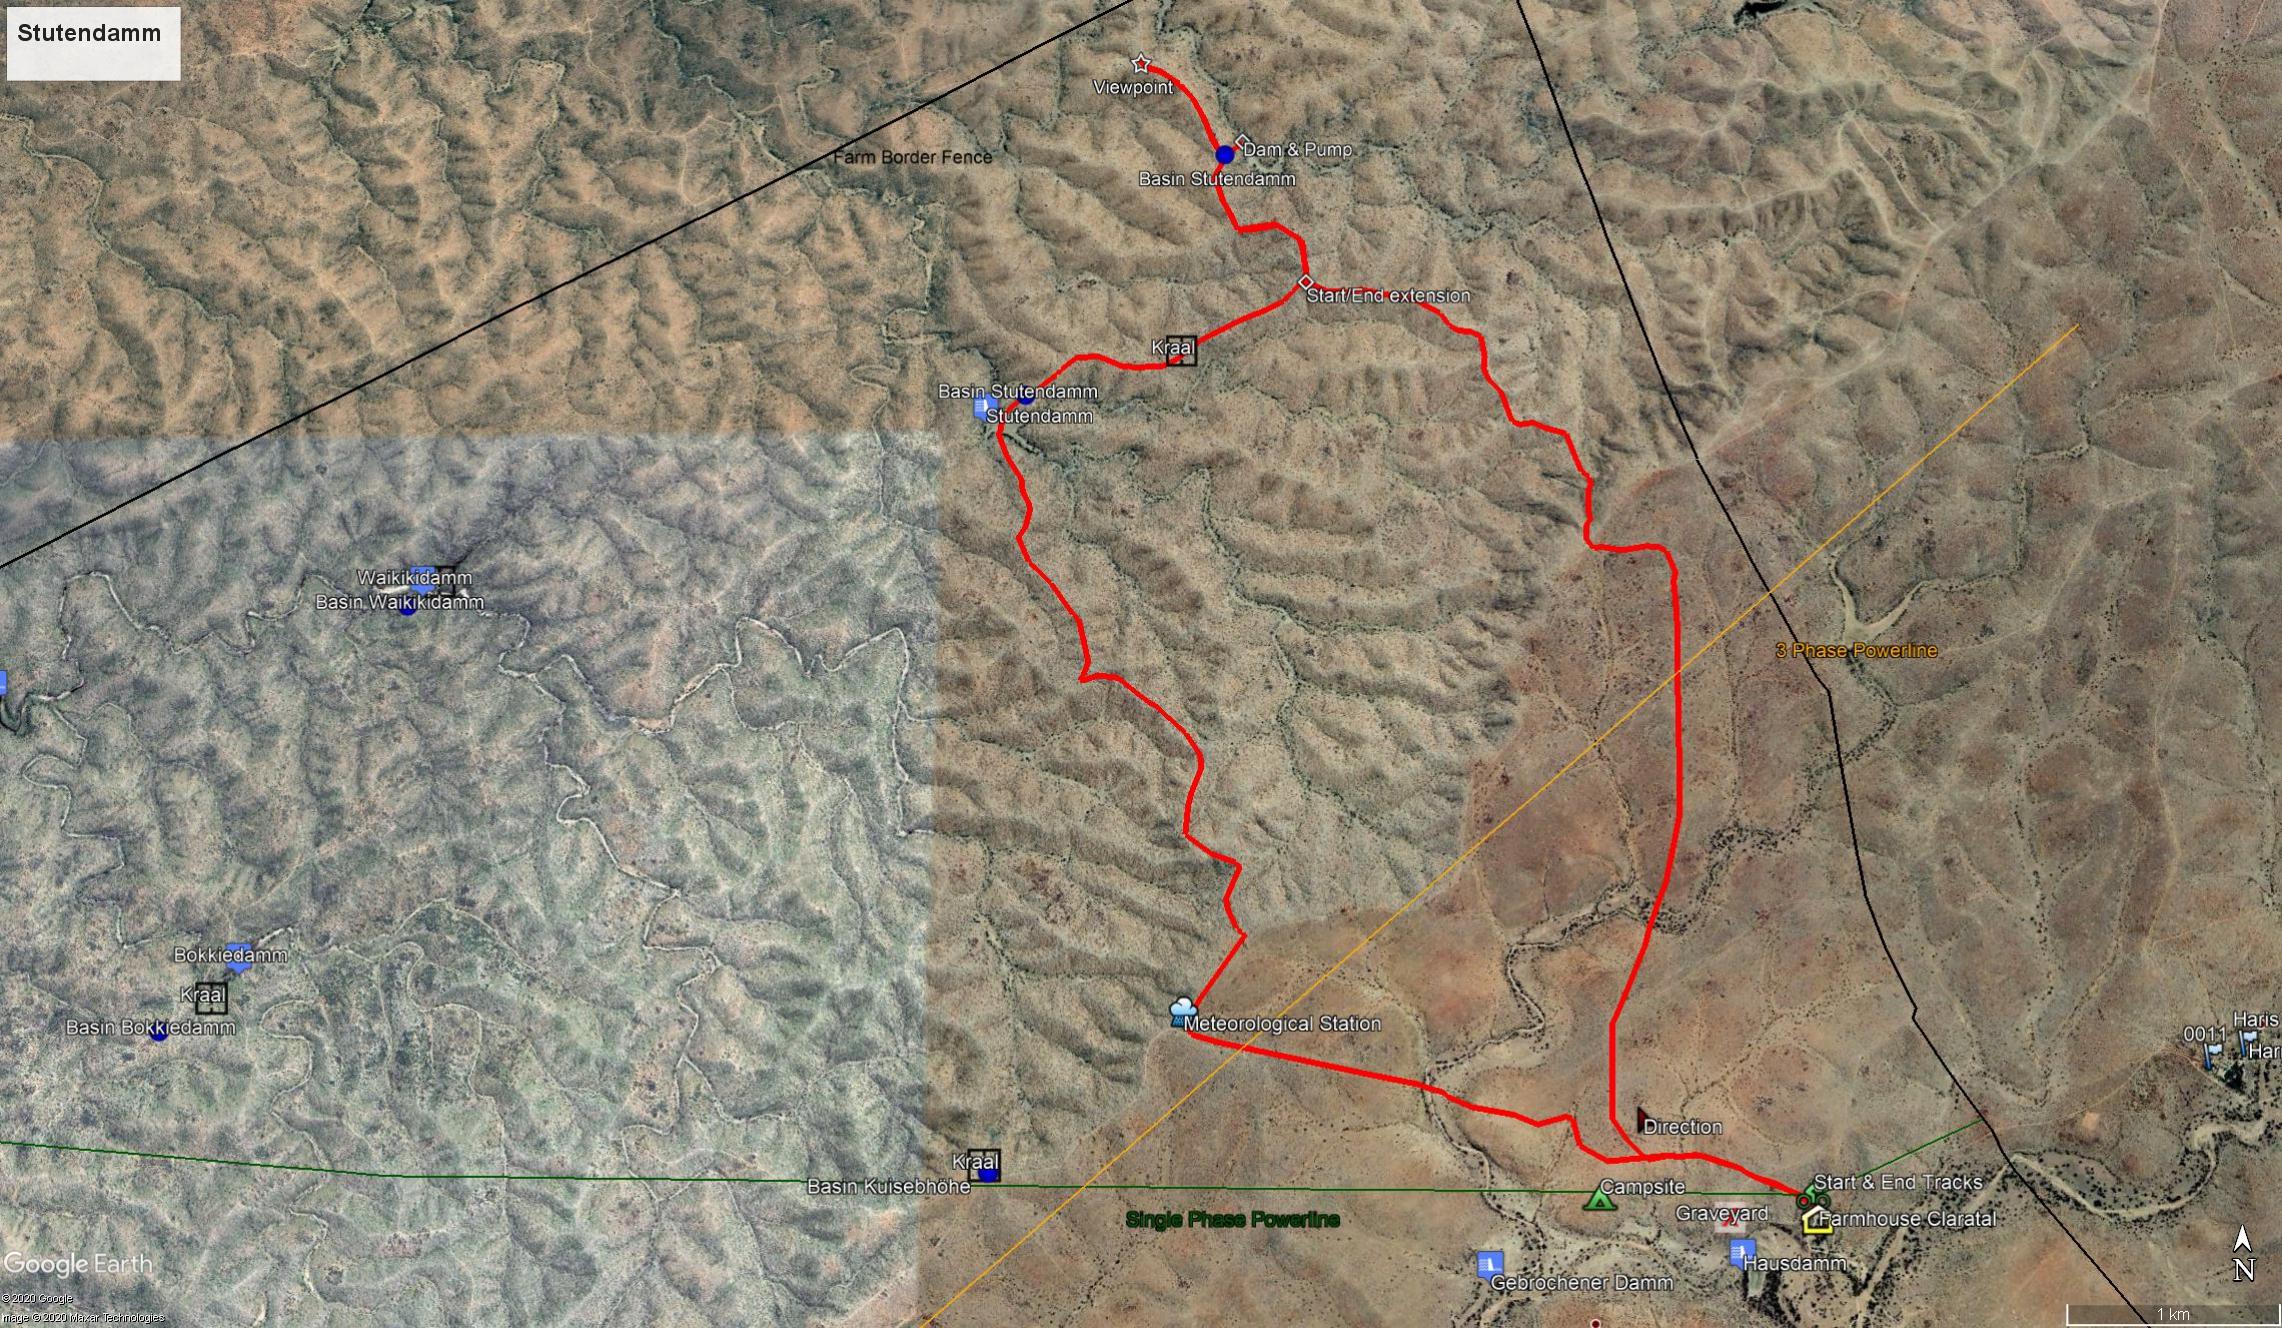 Map Stutendamm Trail